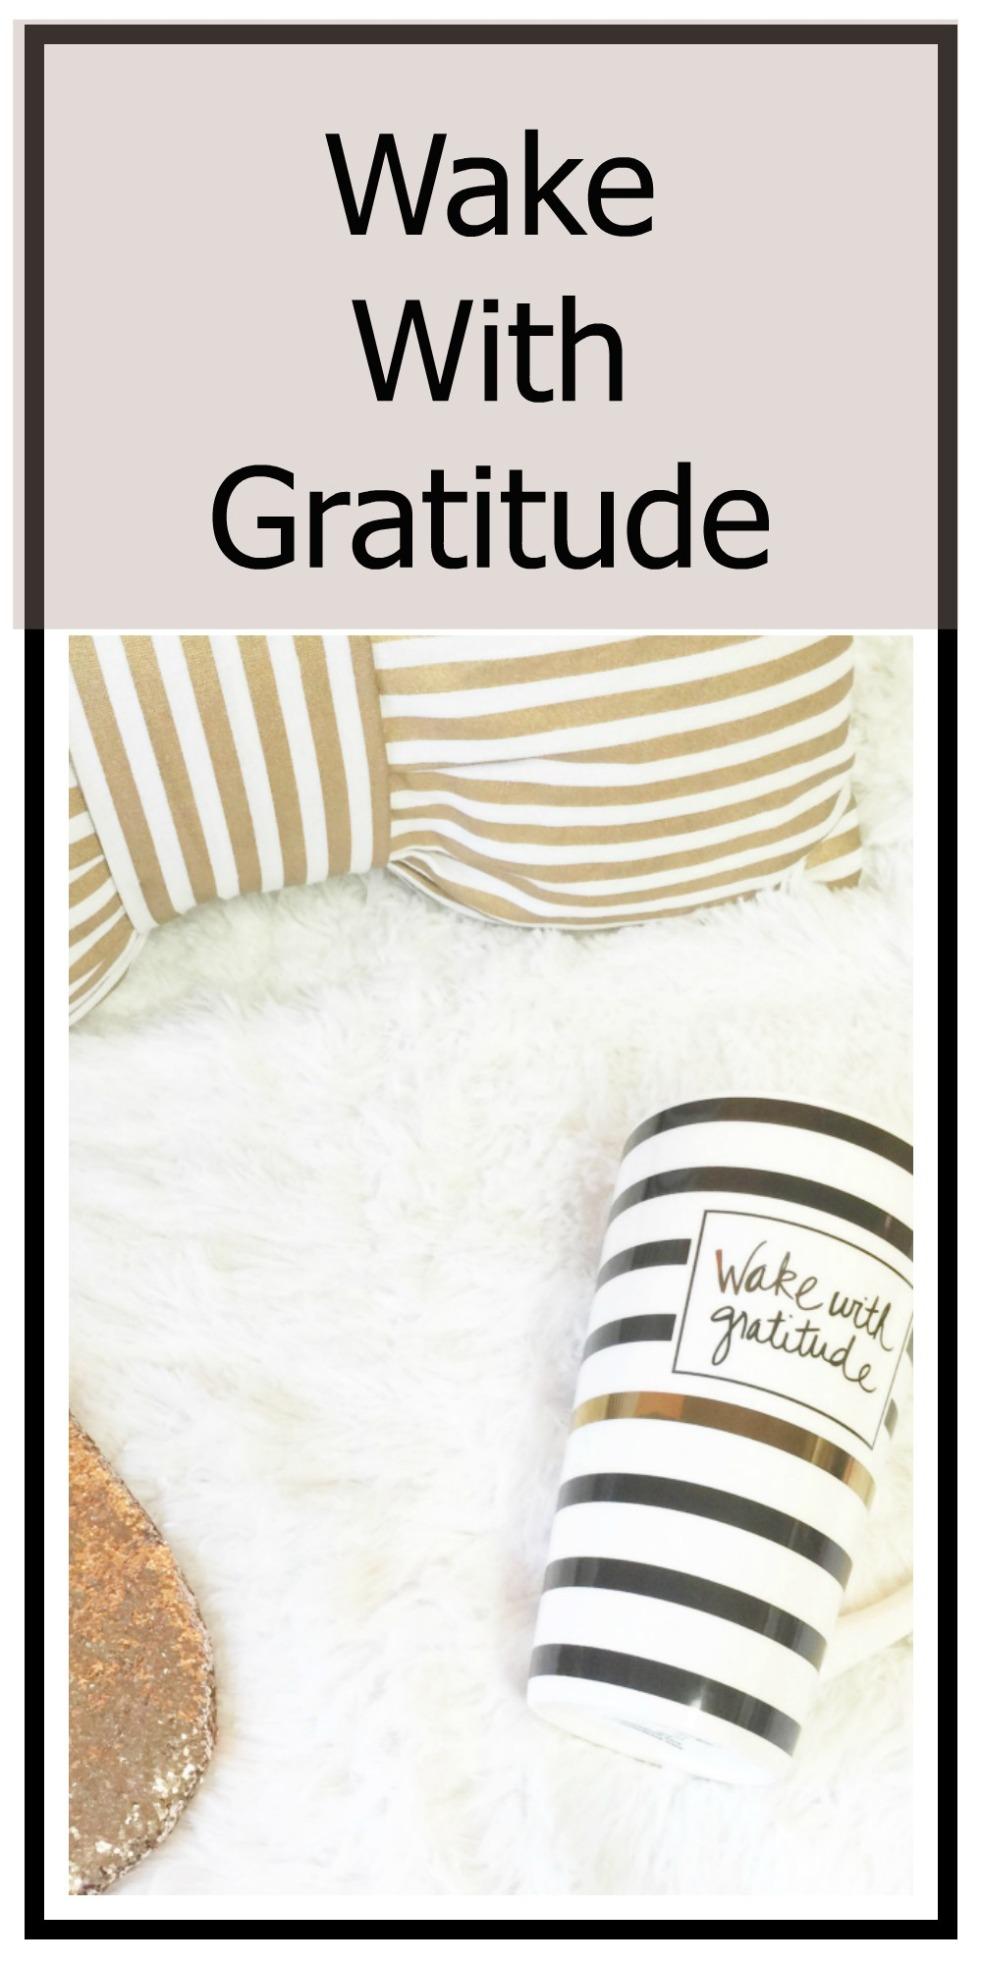 wake-with-gratitude-2